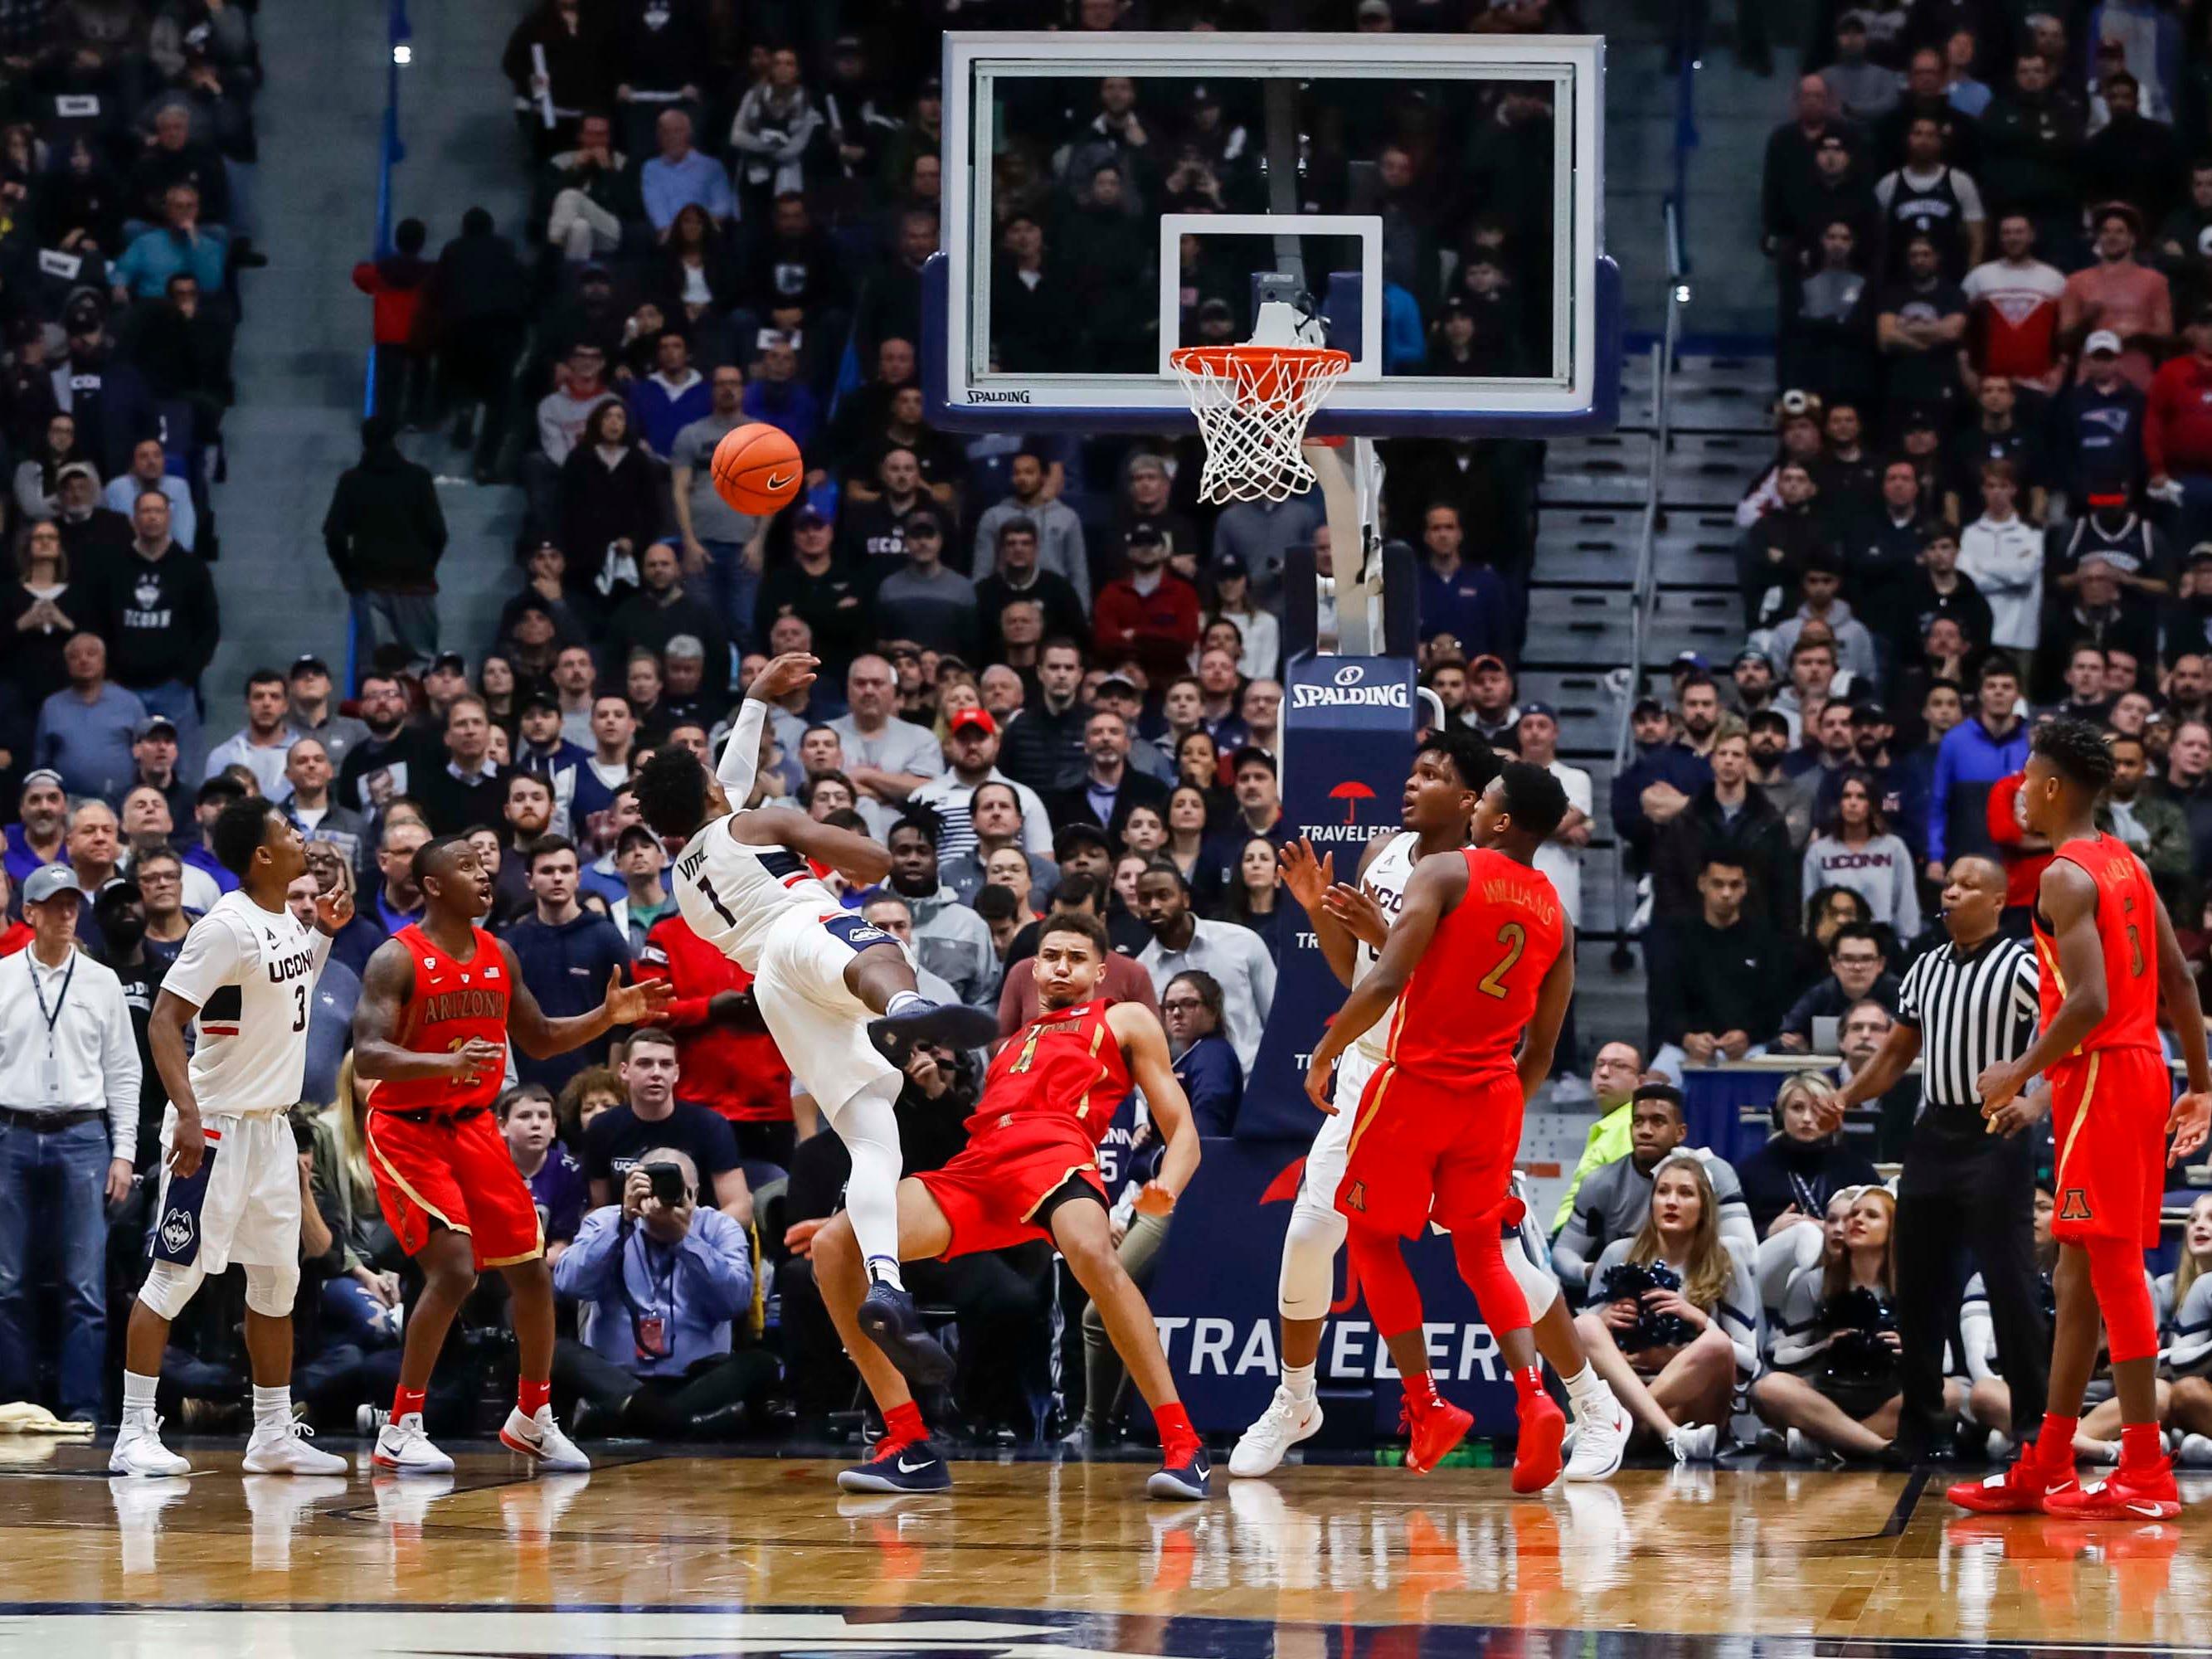 Dec 2, 2018; Storrs, CT, USA; Arizona Wildcats forward Ira Lee (11) fouls Connecticut Huskies guard Christian Vital (1) in the second half at XL Center. Arizona defeated UConn 76-72. Mandatory Credit: David Butler II-USA TODAY Sports